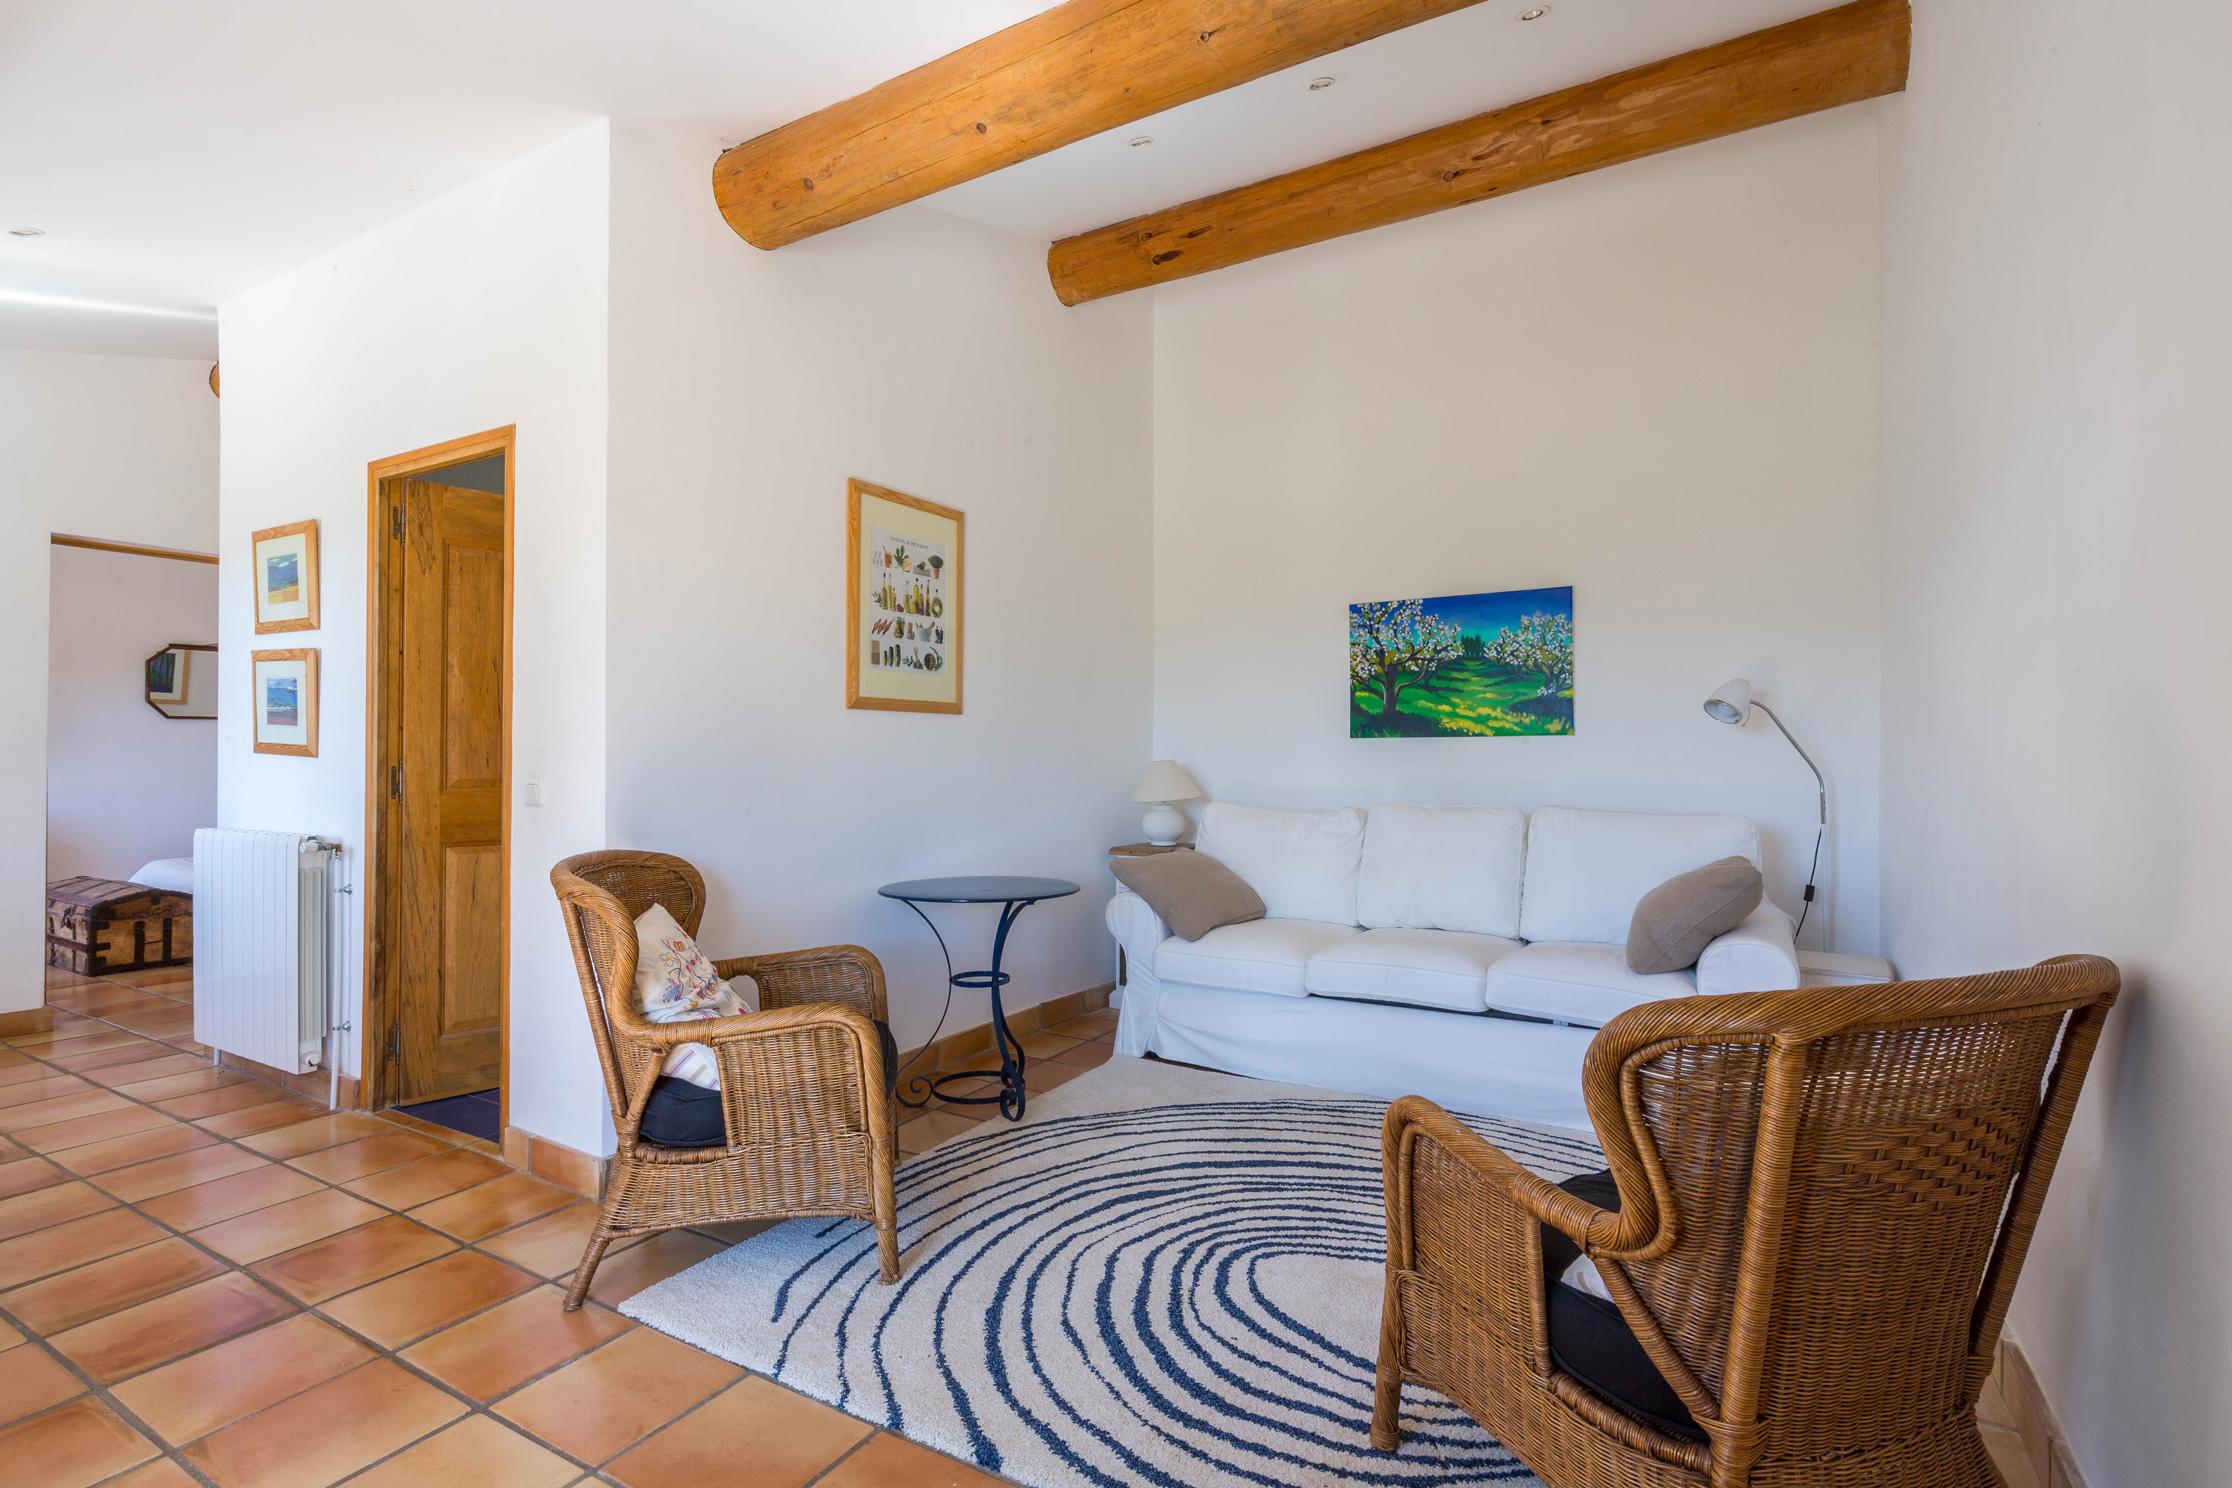 La Petite Source, Additional Villa | La Source, Luberon Rental